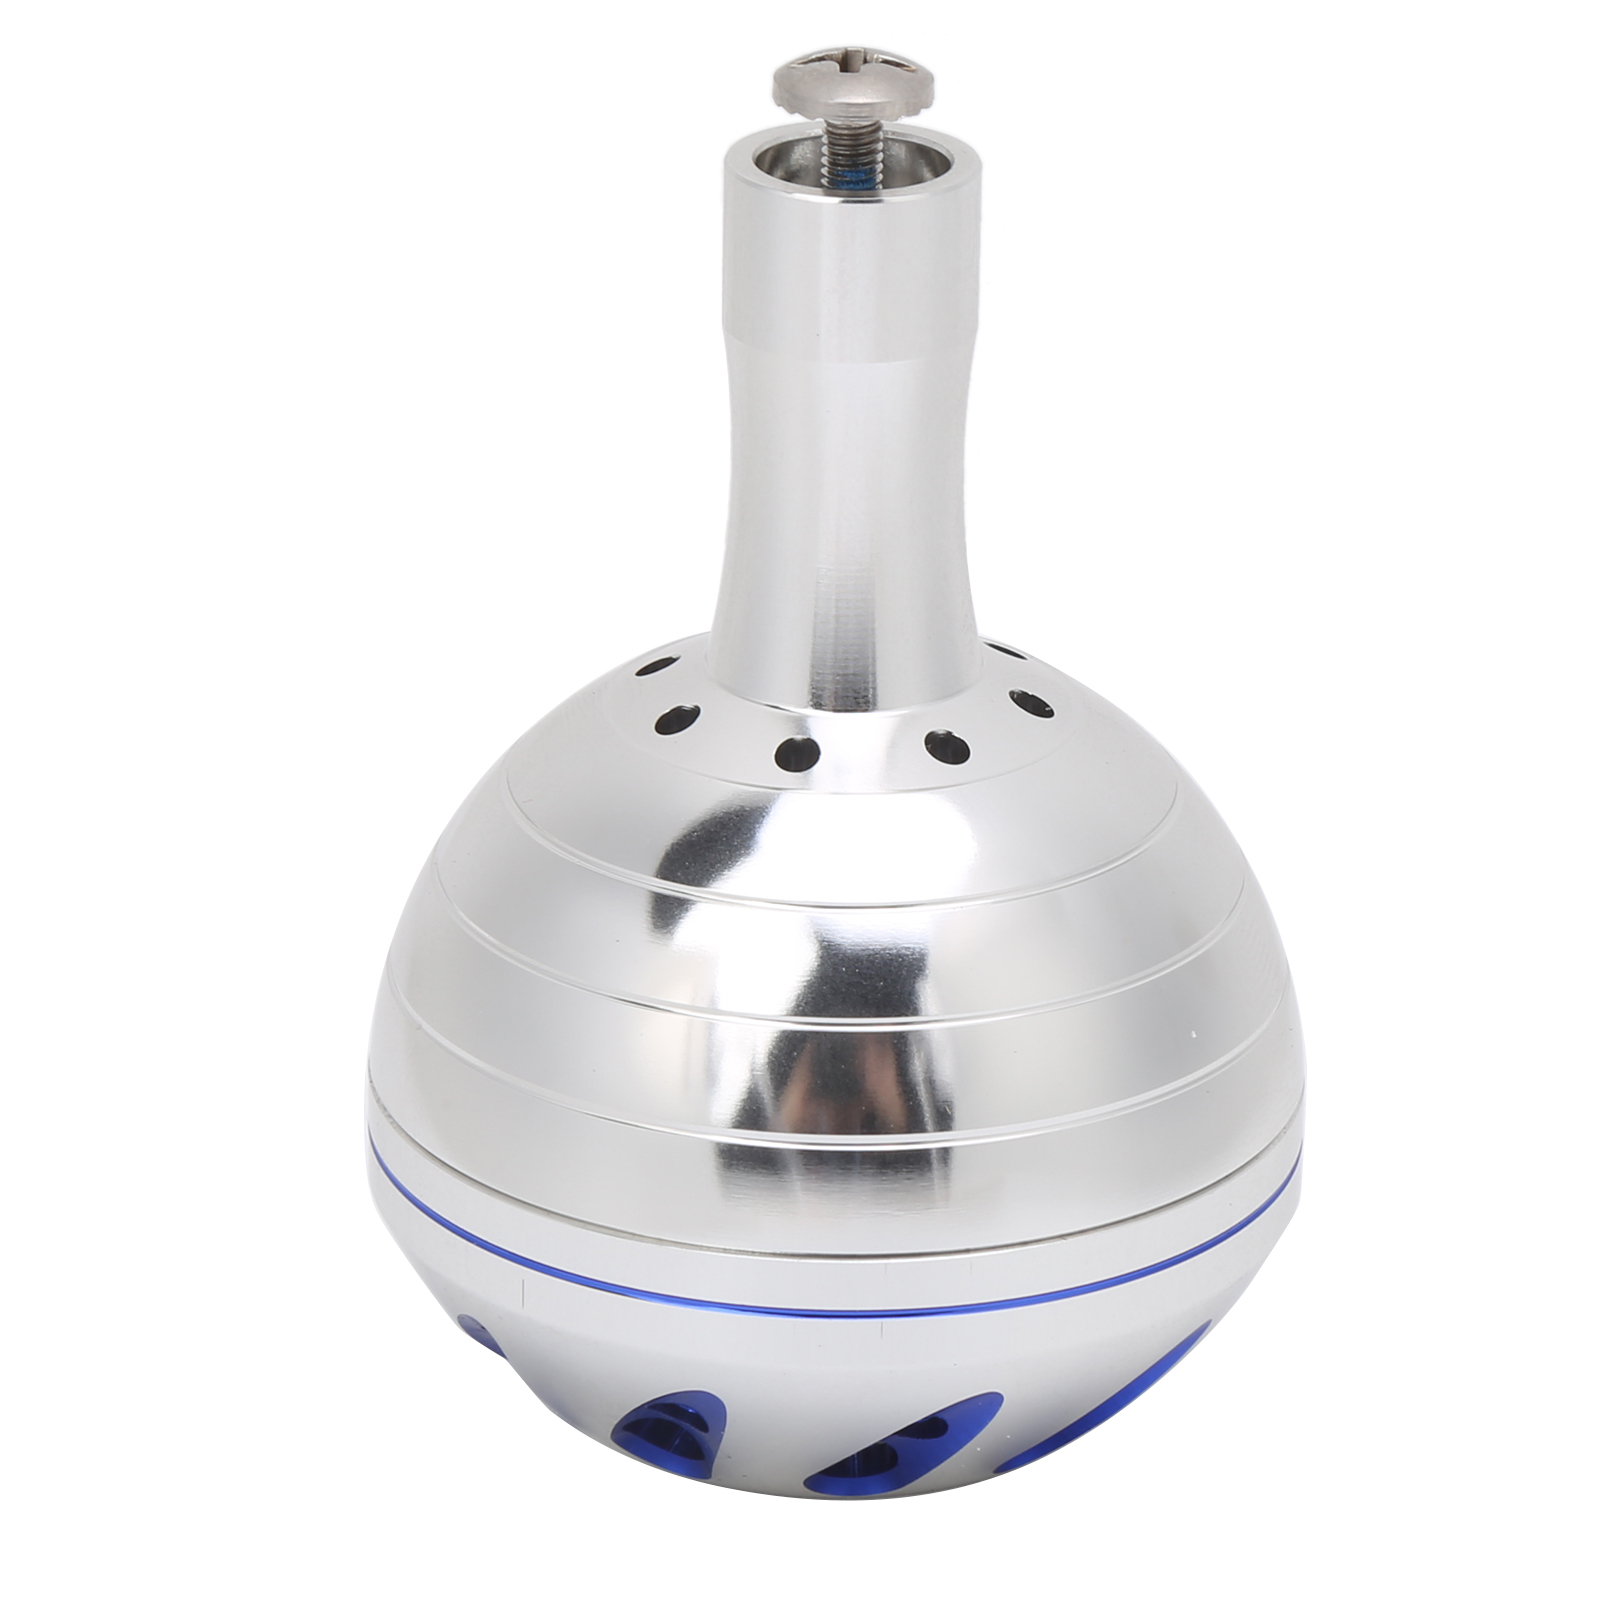 Lightweight-Fishing-Reel-Handle-Power-Knob-for-Bait-Casting-Spining-Jigging-Reel thumbnail 14